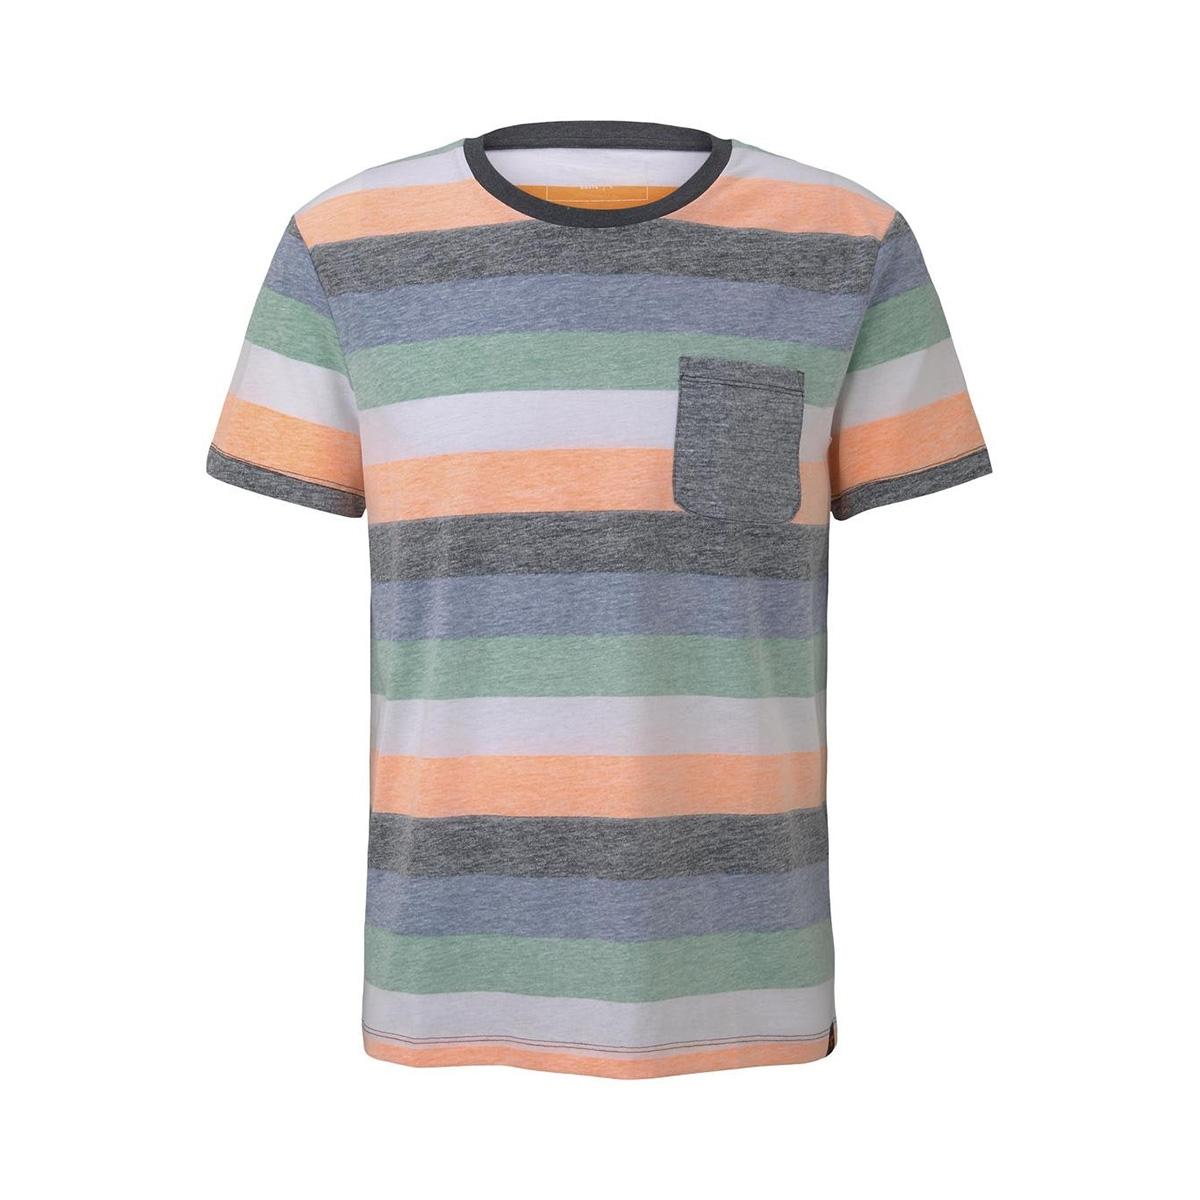 gestreept t shirt met borstzak 1017290xx12 tom tailor t-shirt 22193